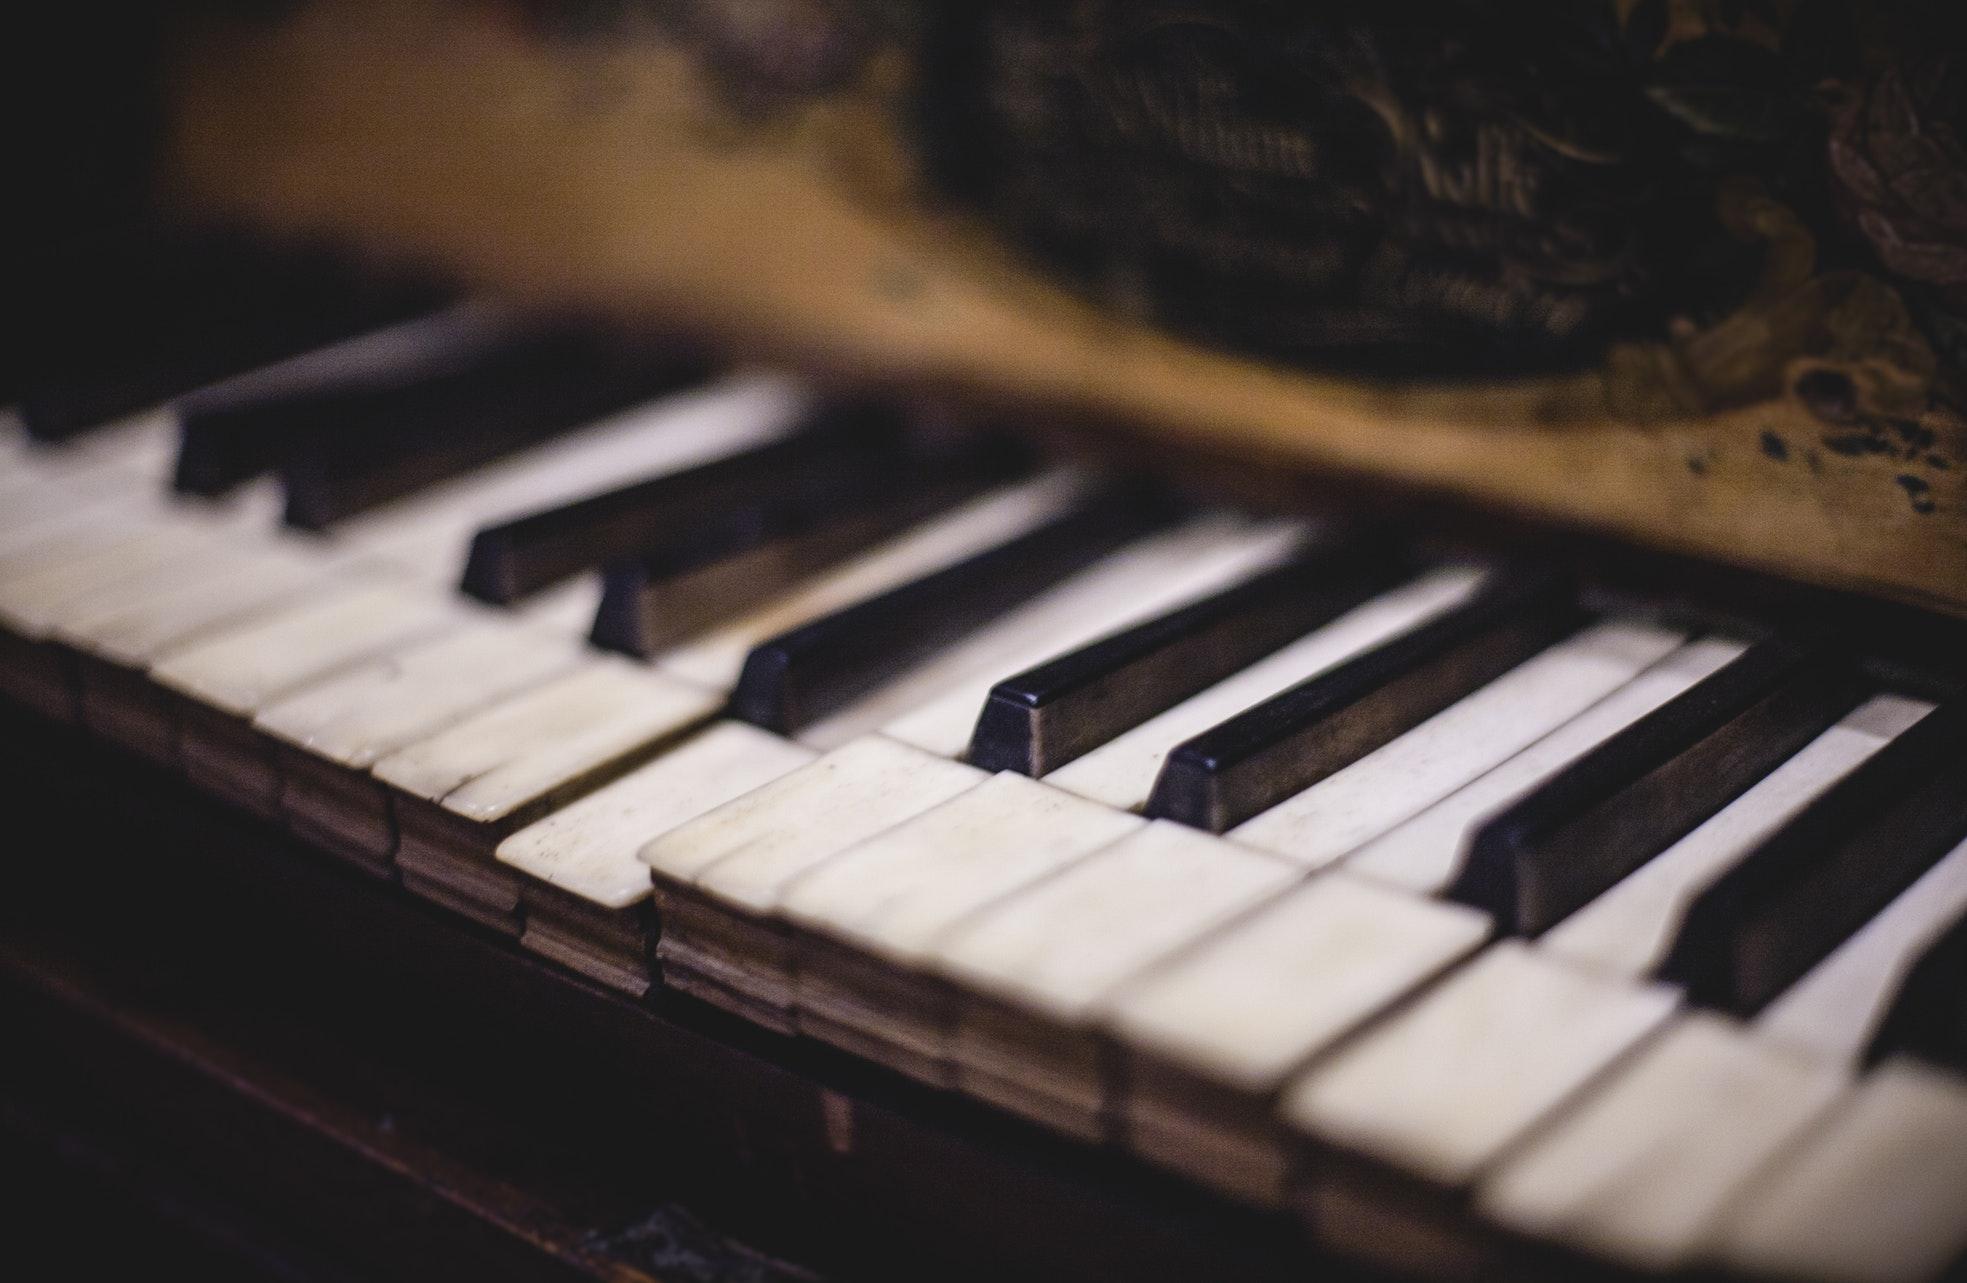 A close-up photo of askew piano keys.